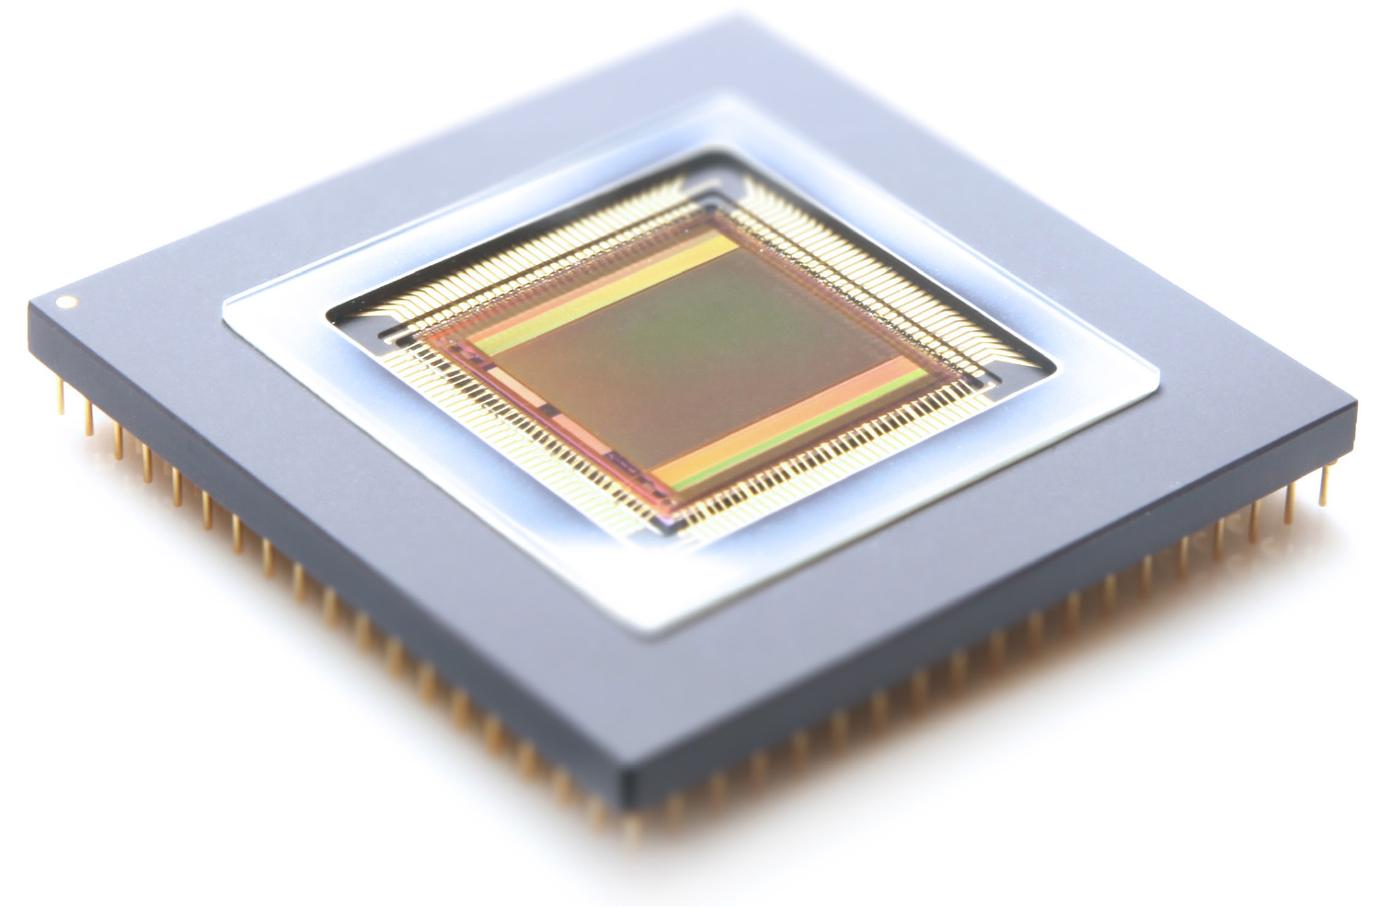 cmos-ccd-technology_sensor_half_width_1380x907px